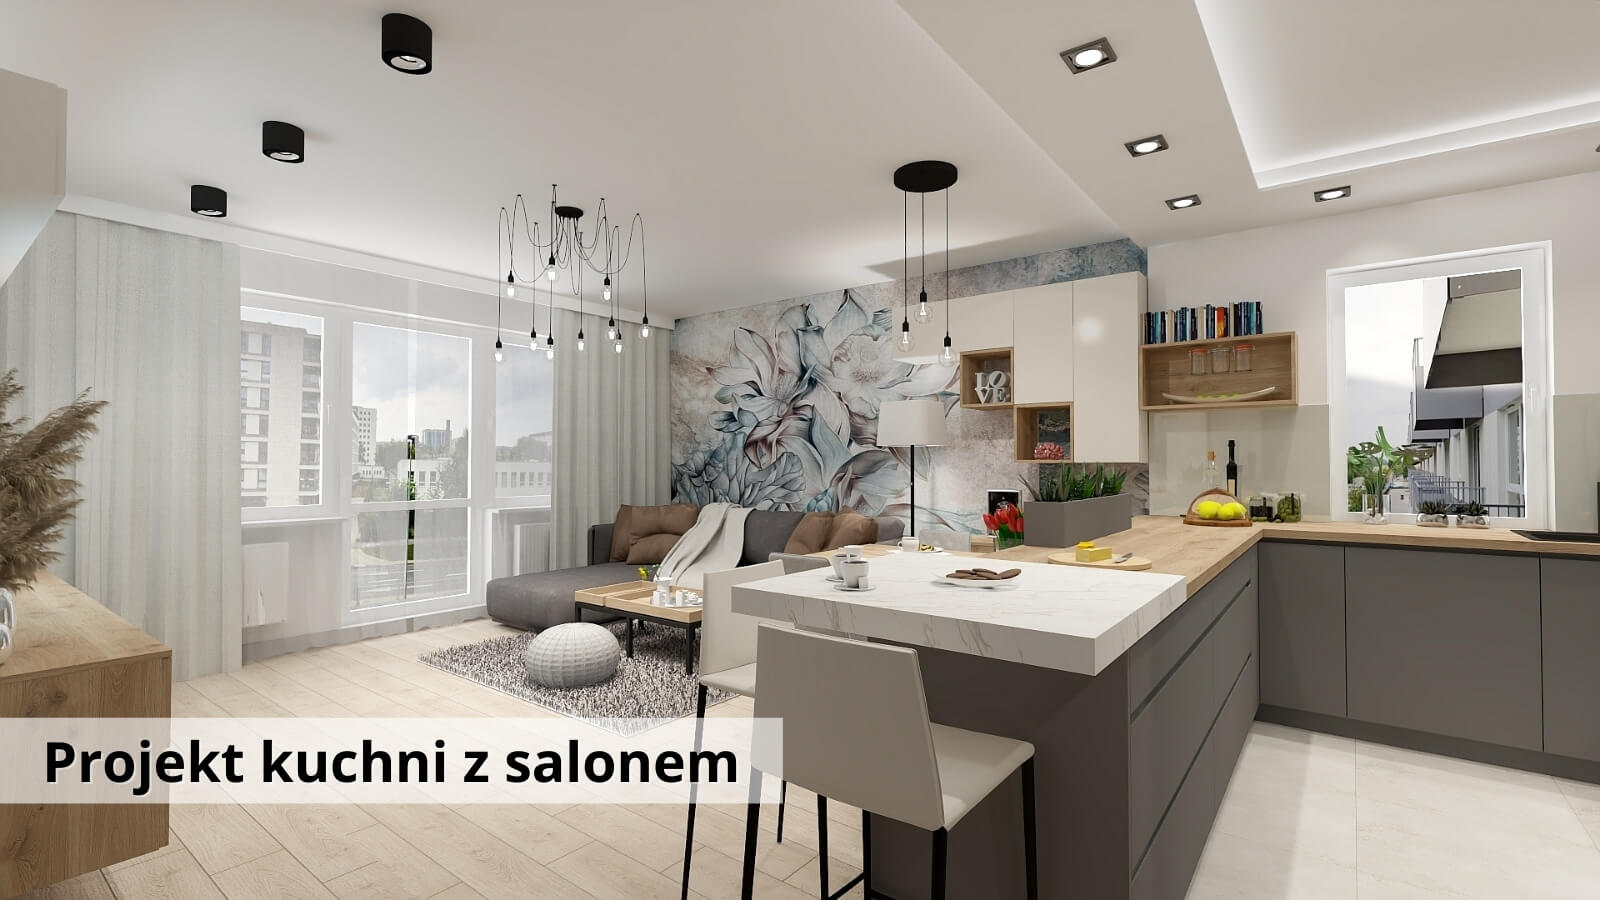 Projekt kuchni z salonem